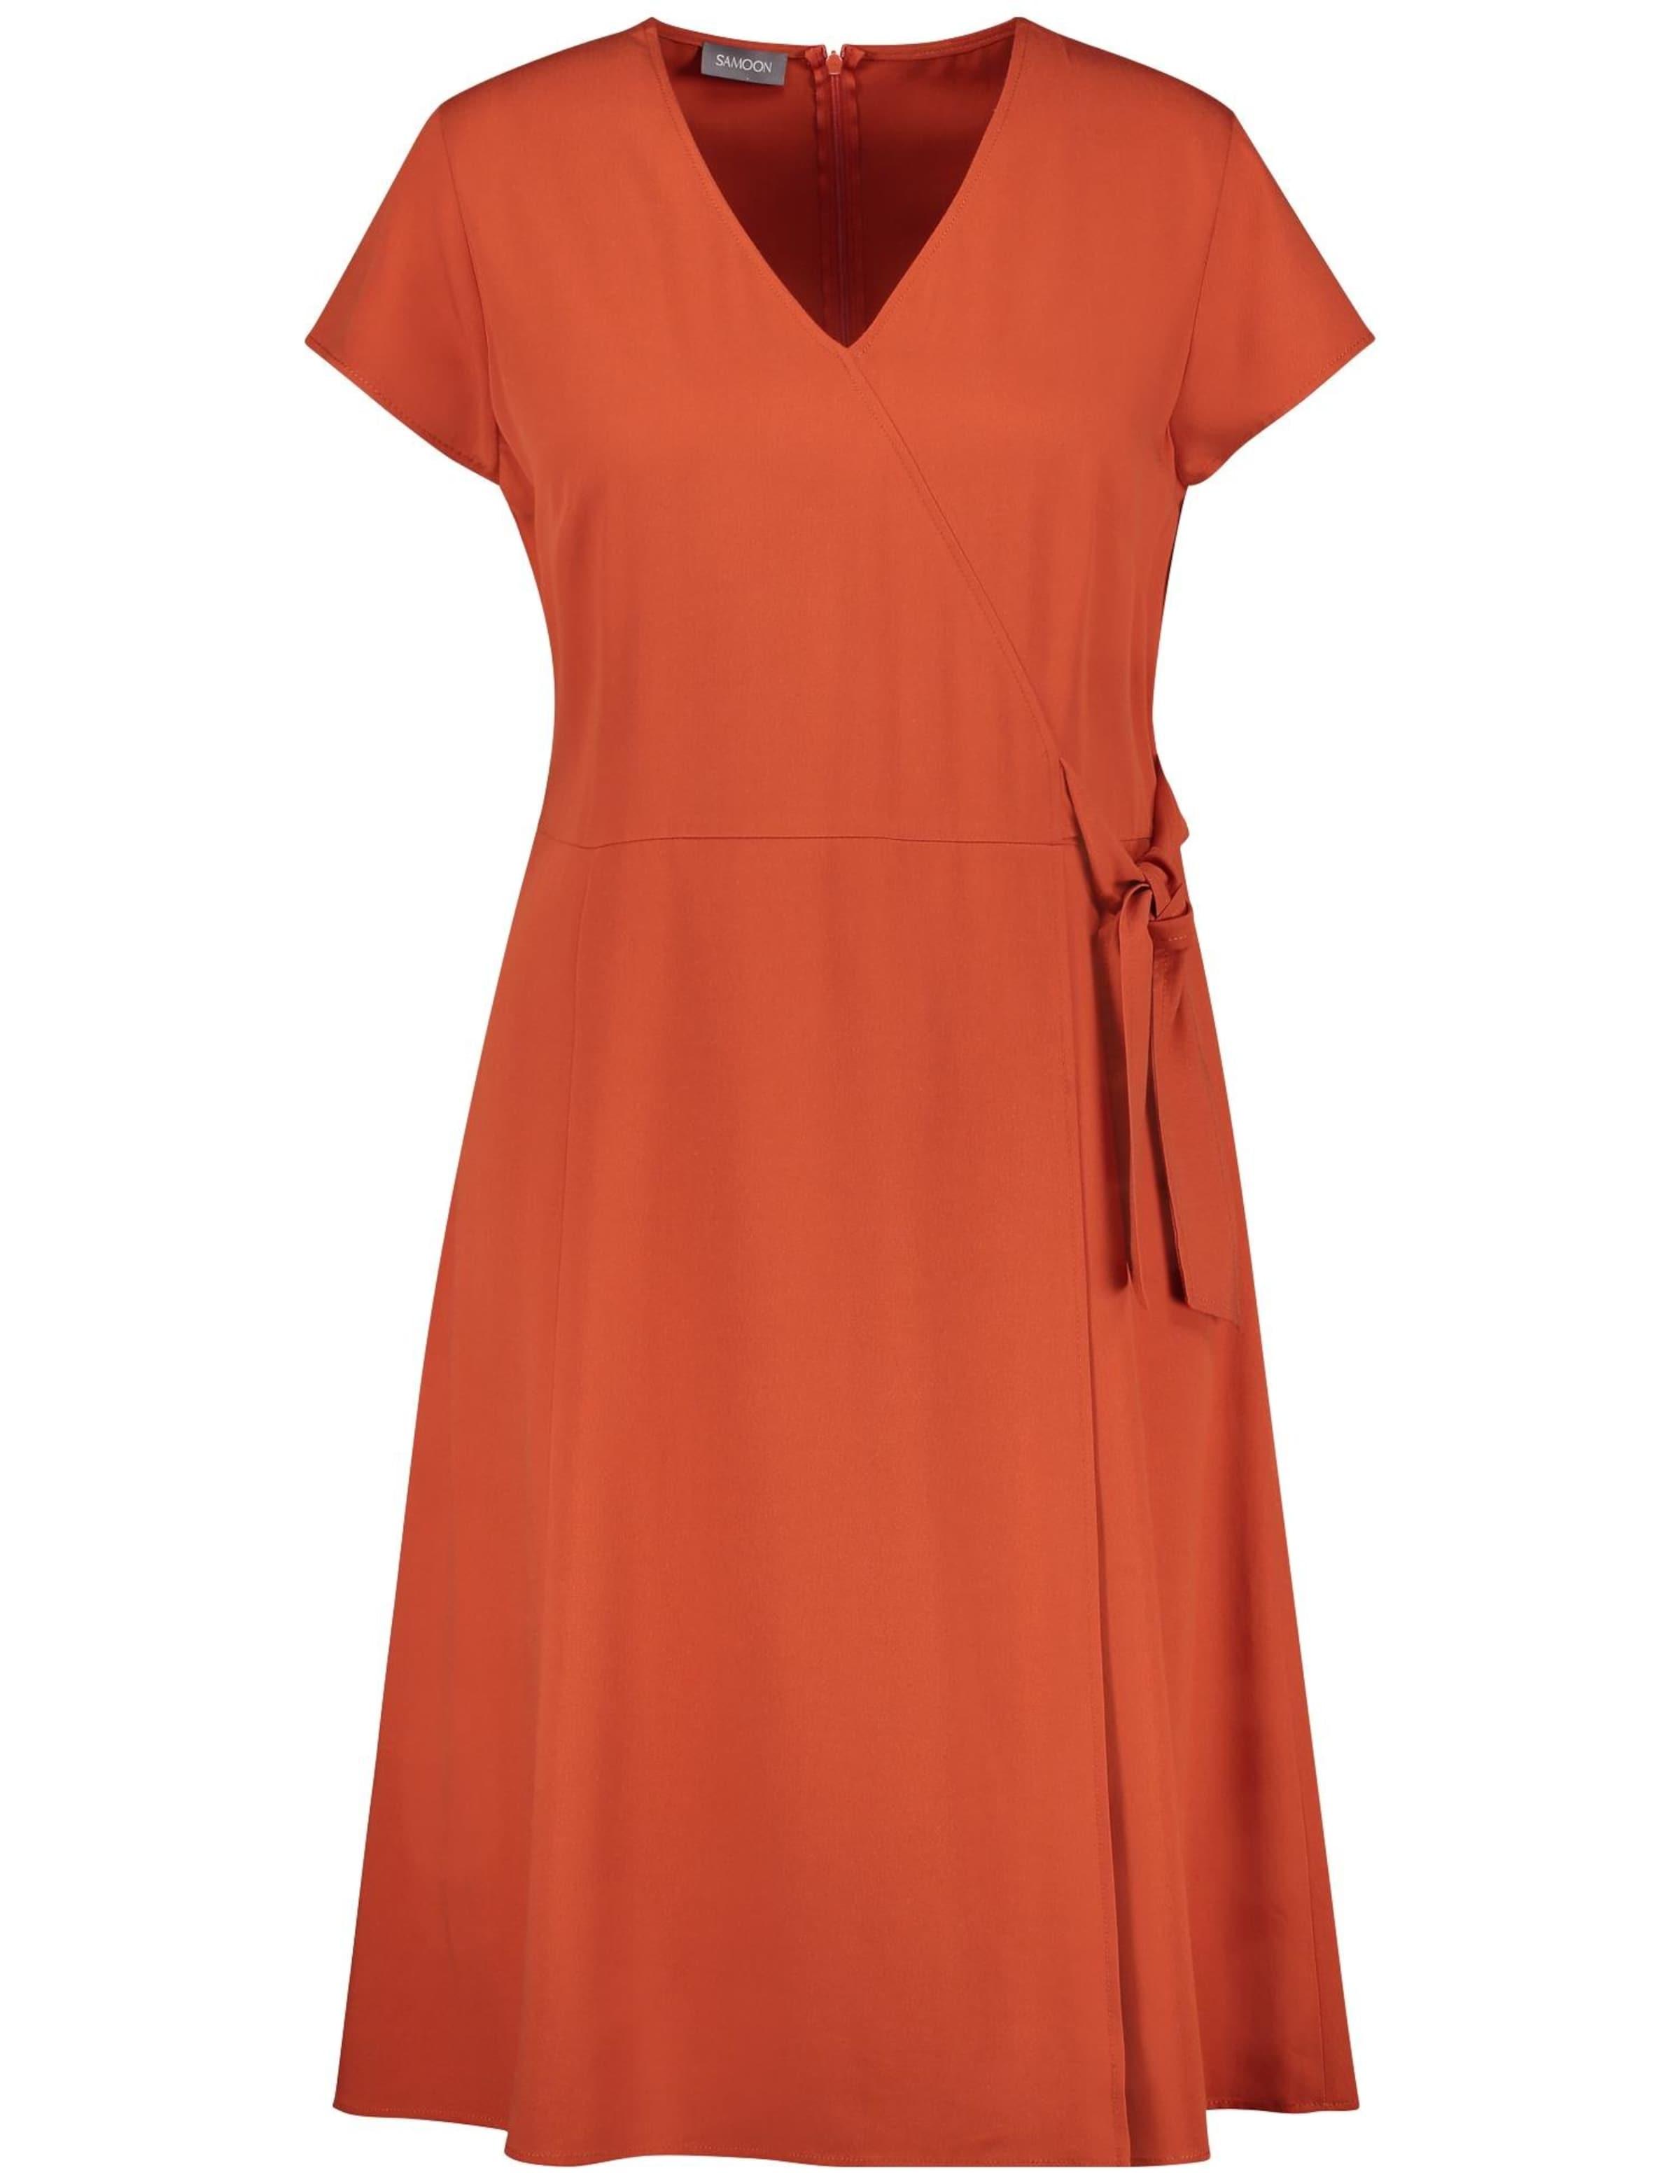 Samoon Samoon Samoon Orange Kleid In Kleid In Kleid Orange In Samoon Orange 0wmN8n